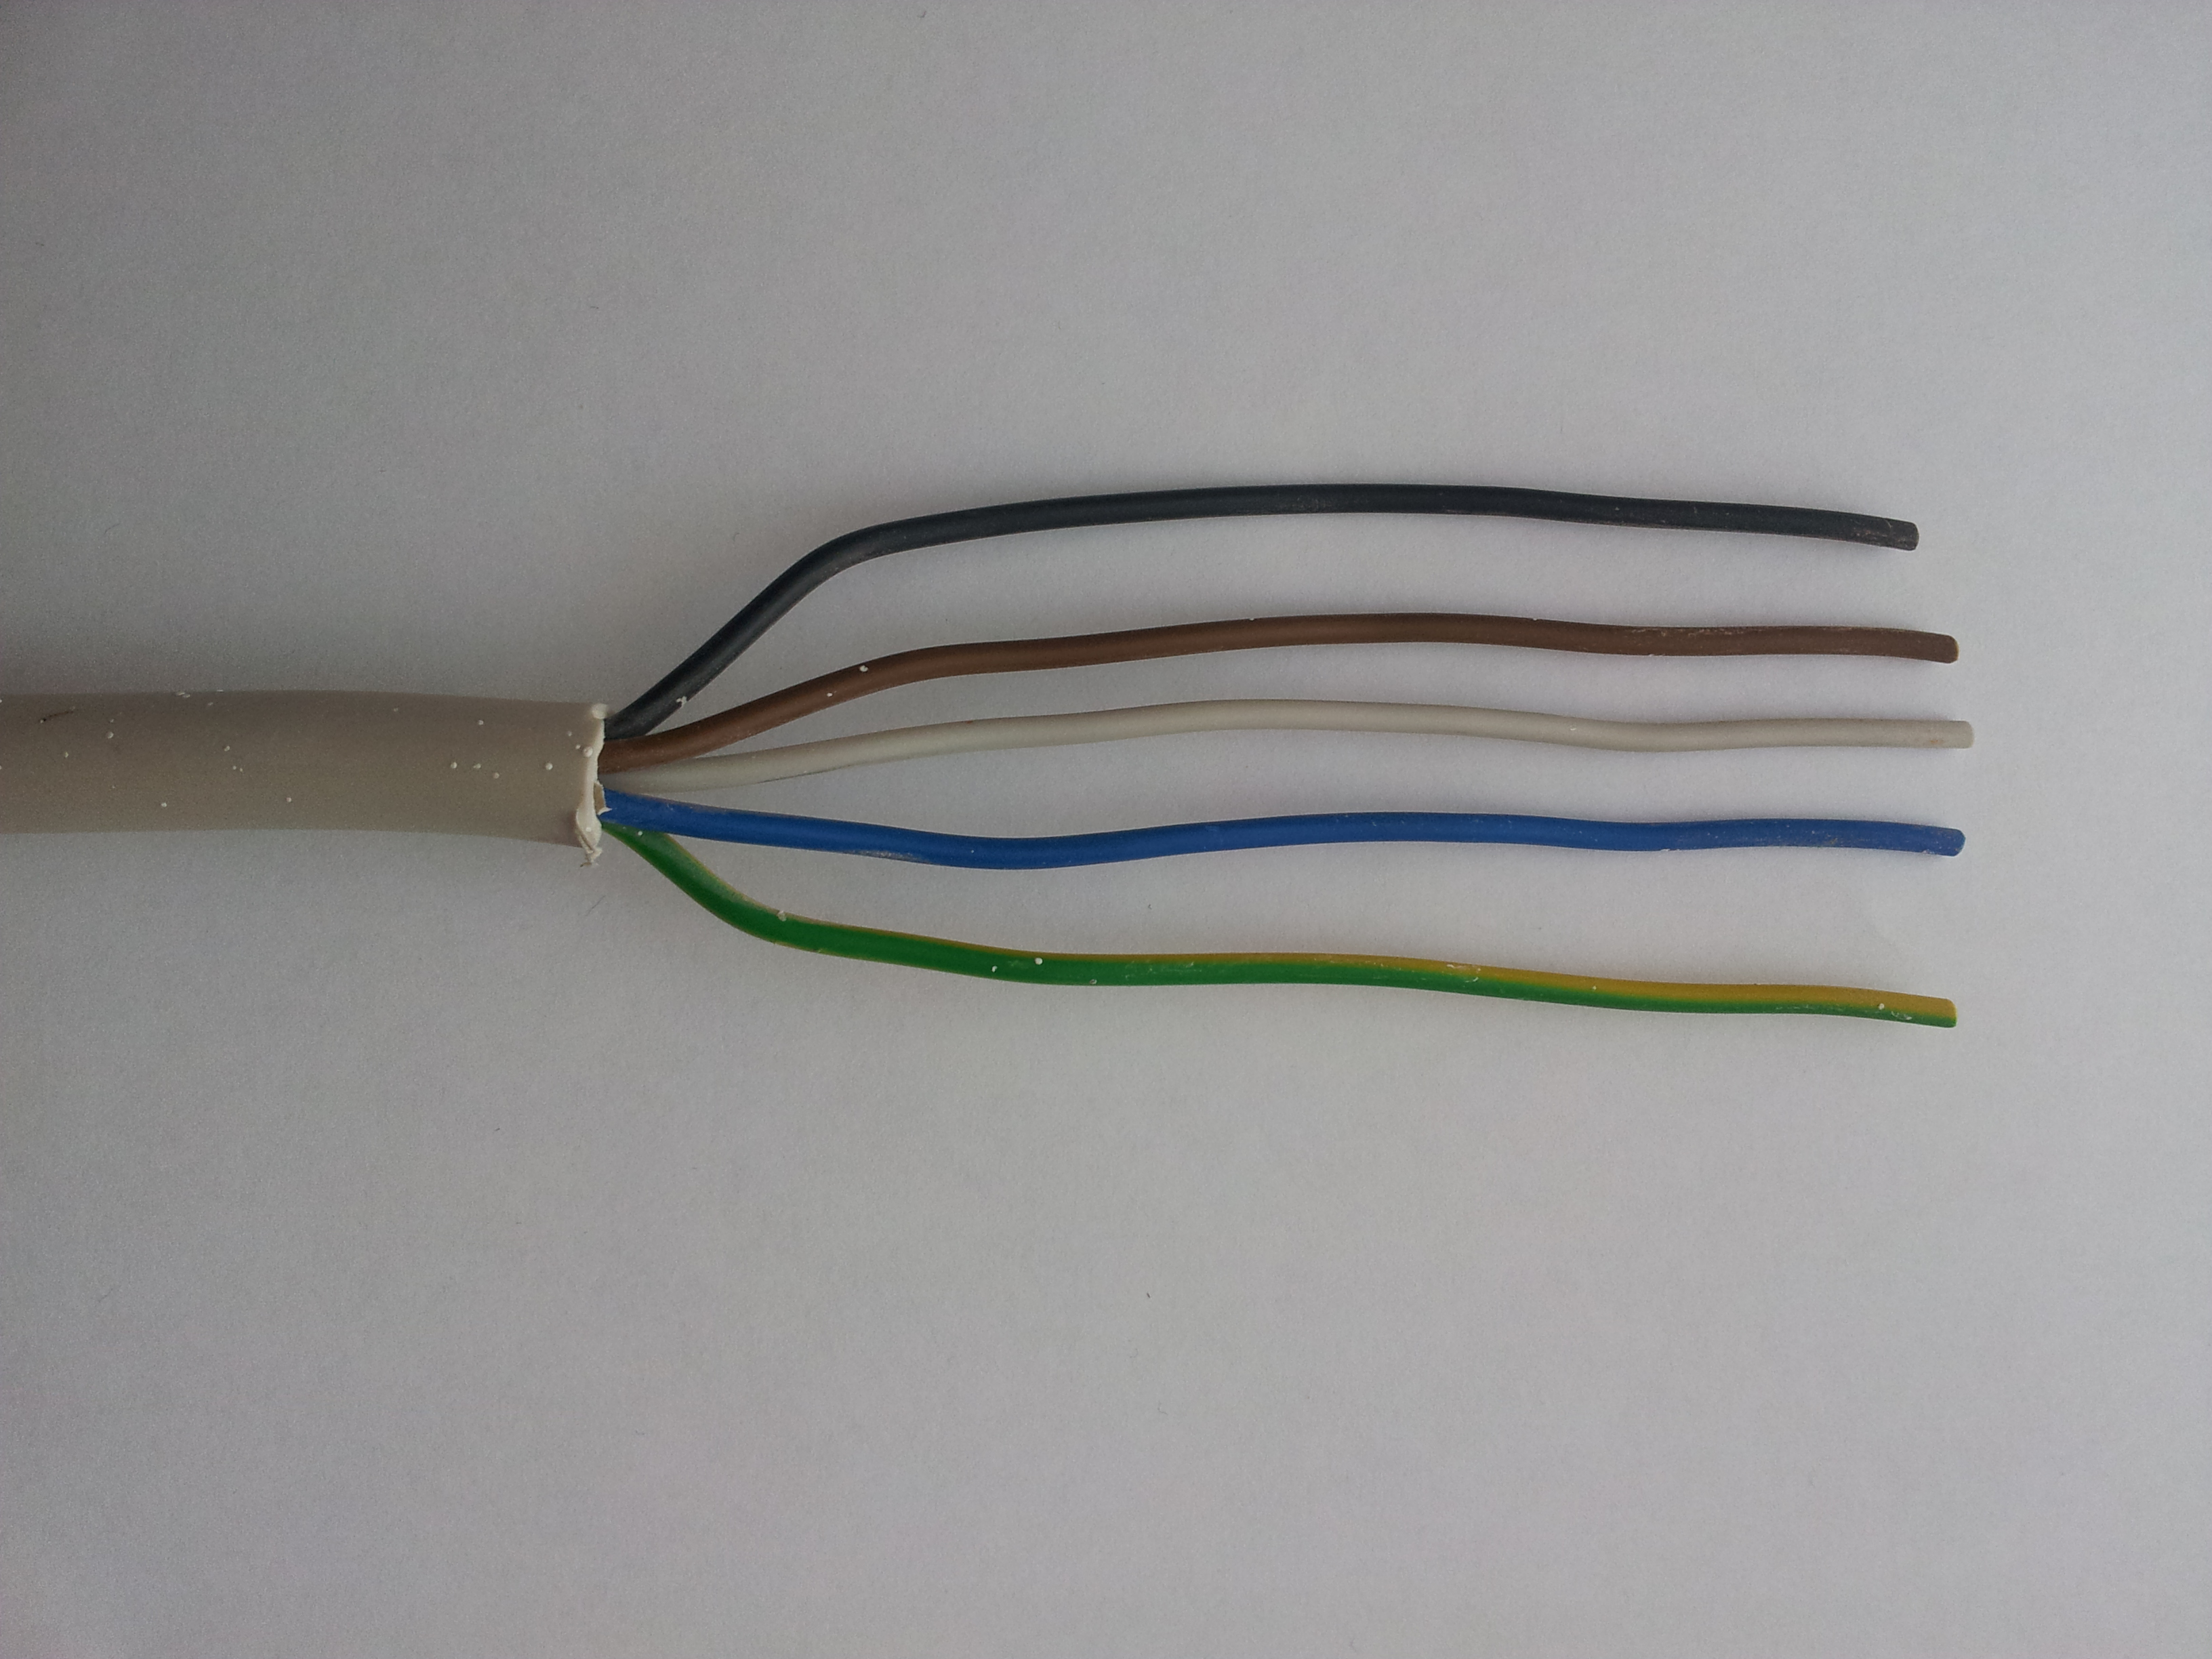 nym-kabel | nym-kabel verlegen | nym-kabel elektroinstallation